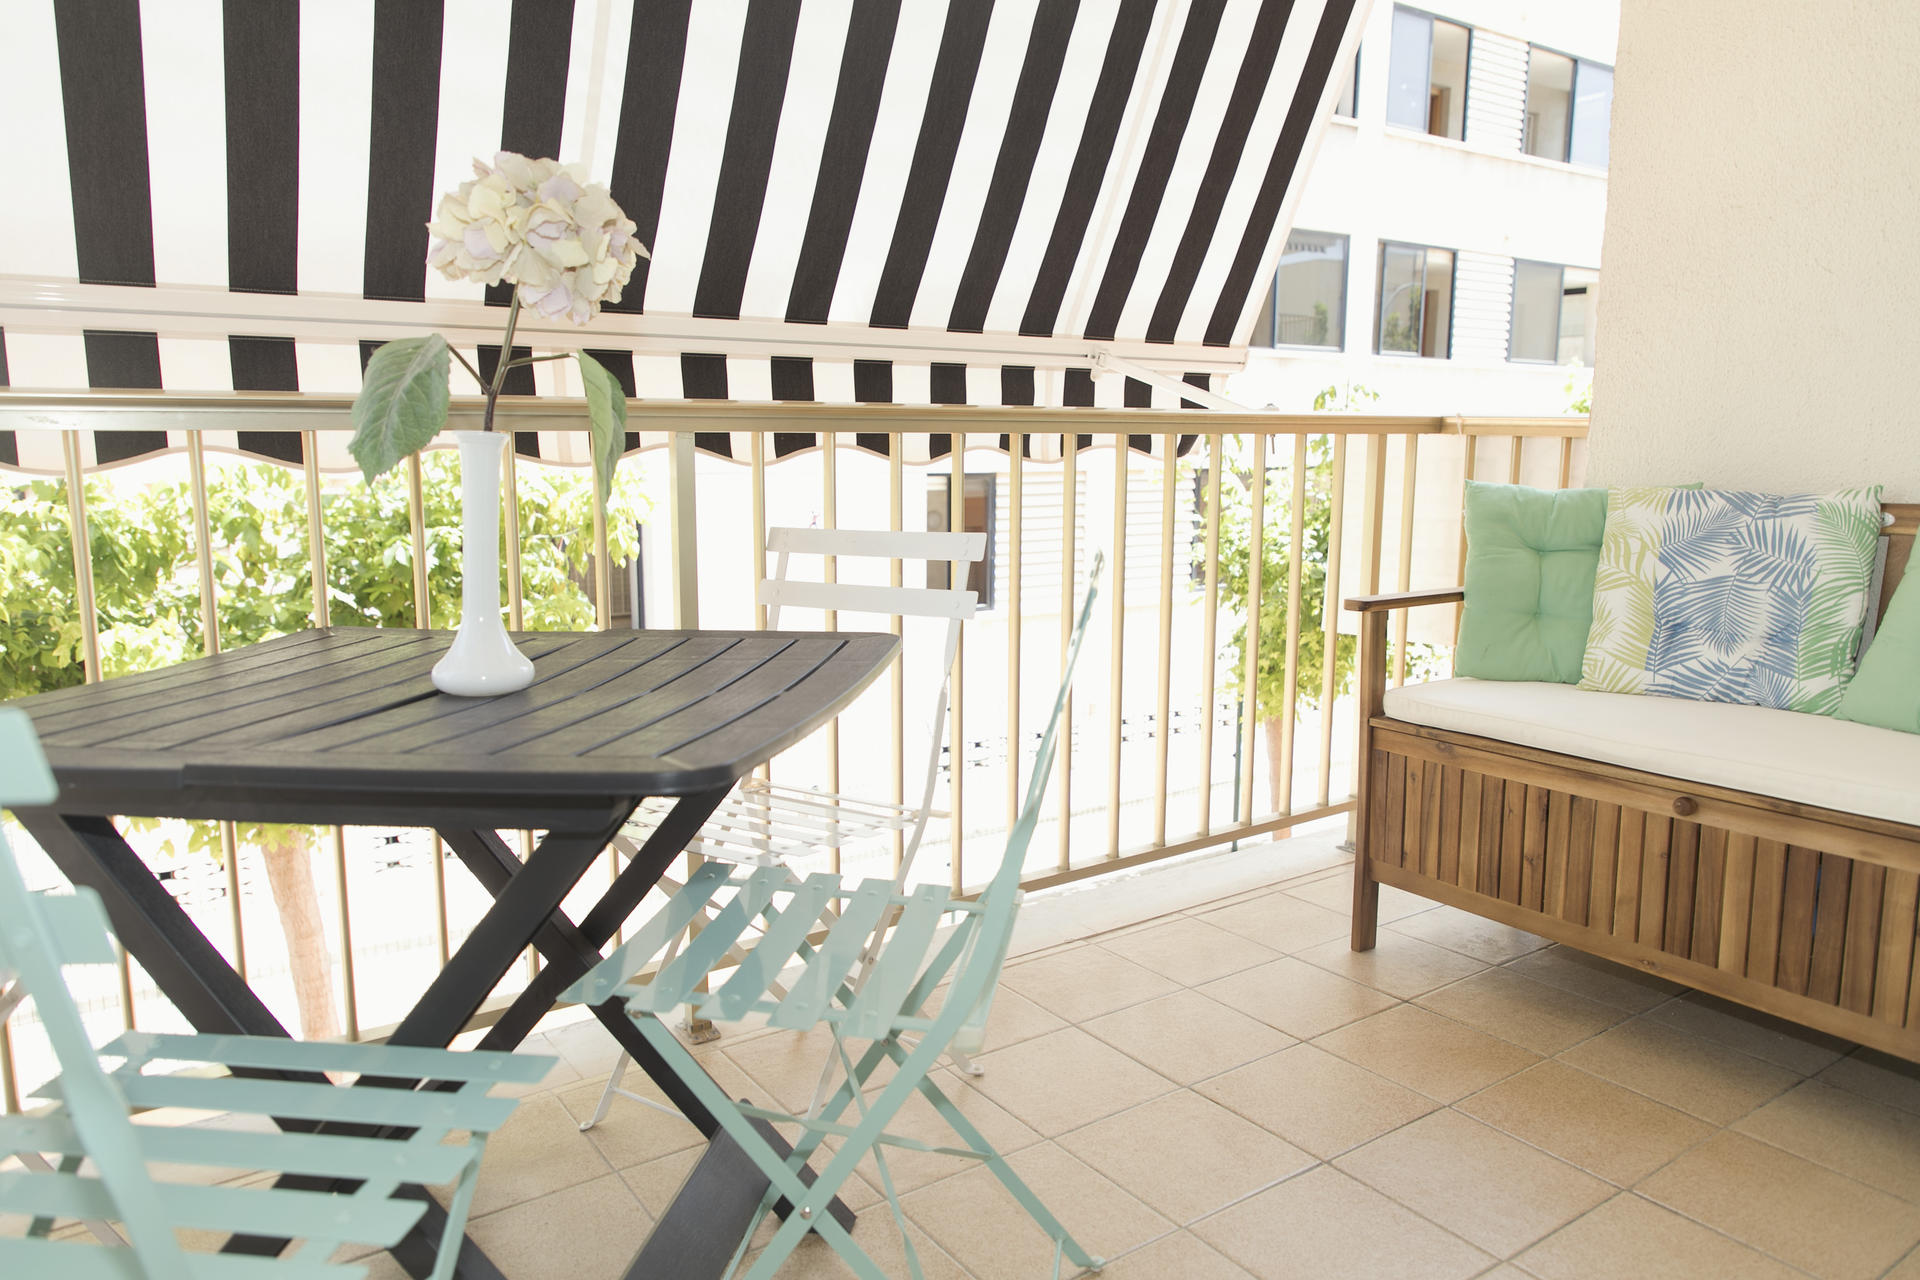 Apartamento -                                       Cambrils -                                       2 dormitorios -                                       6 ocupantes